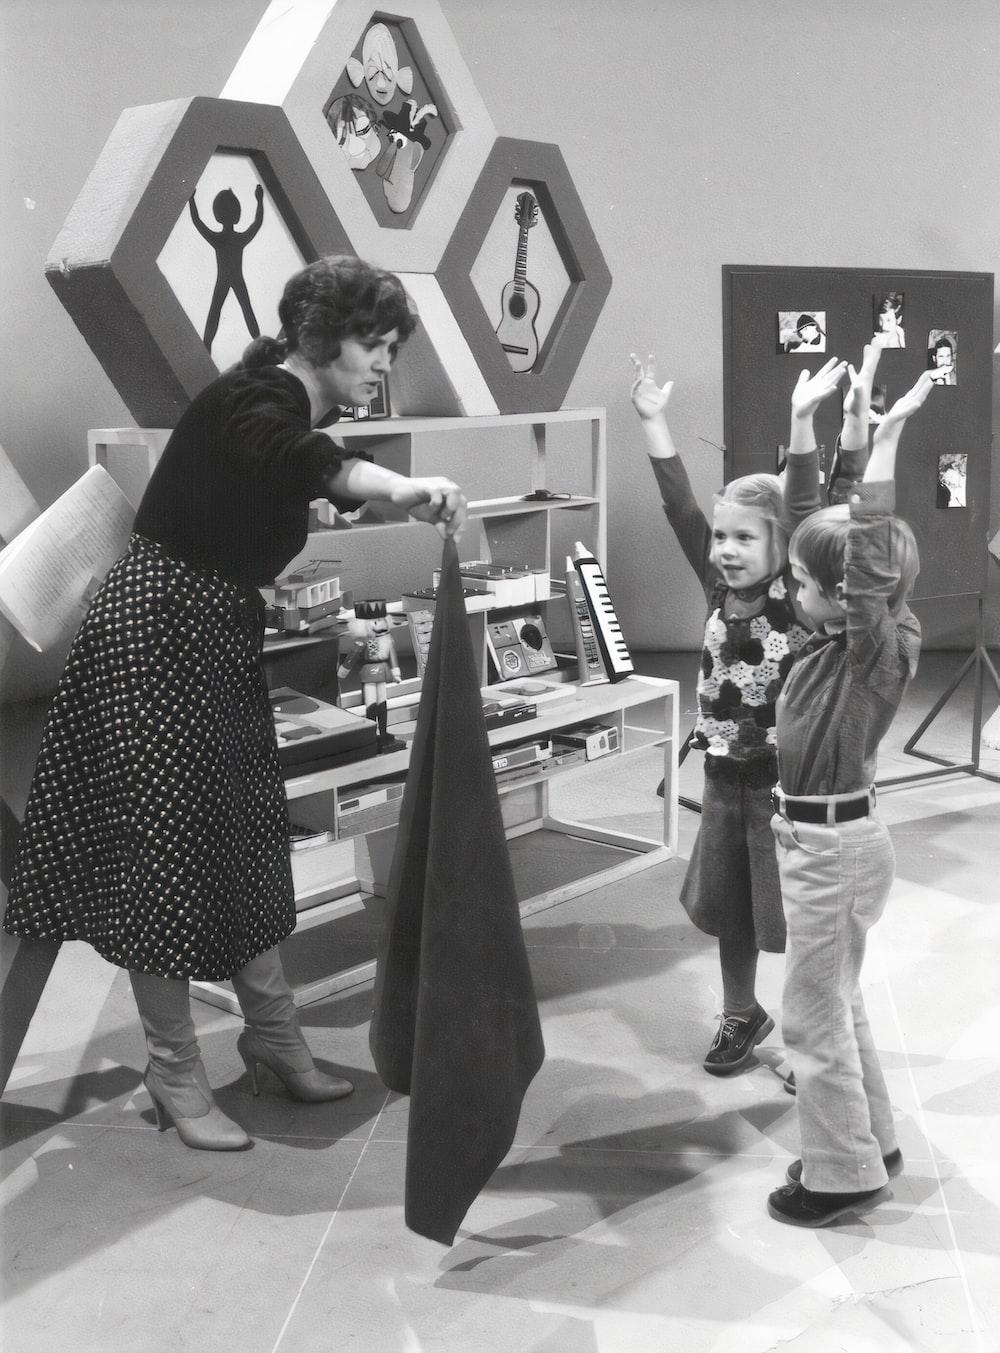 woman in polka dot dress standing beside man in black and white polka dot shirt